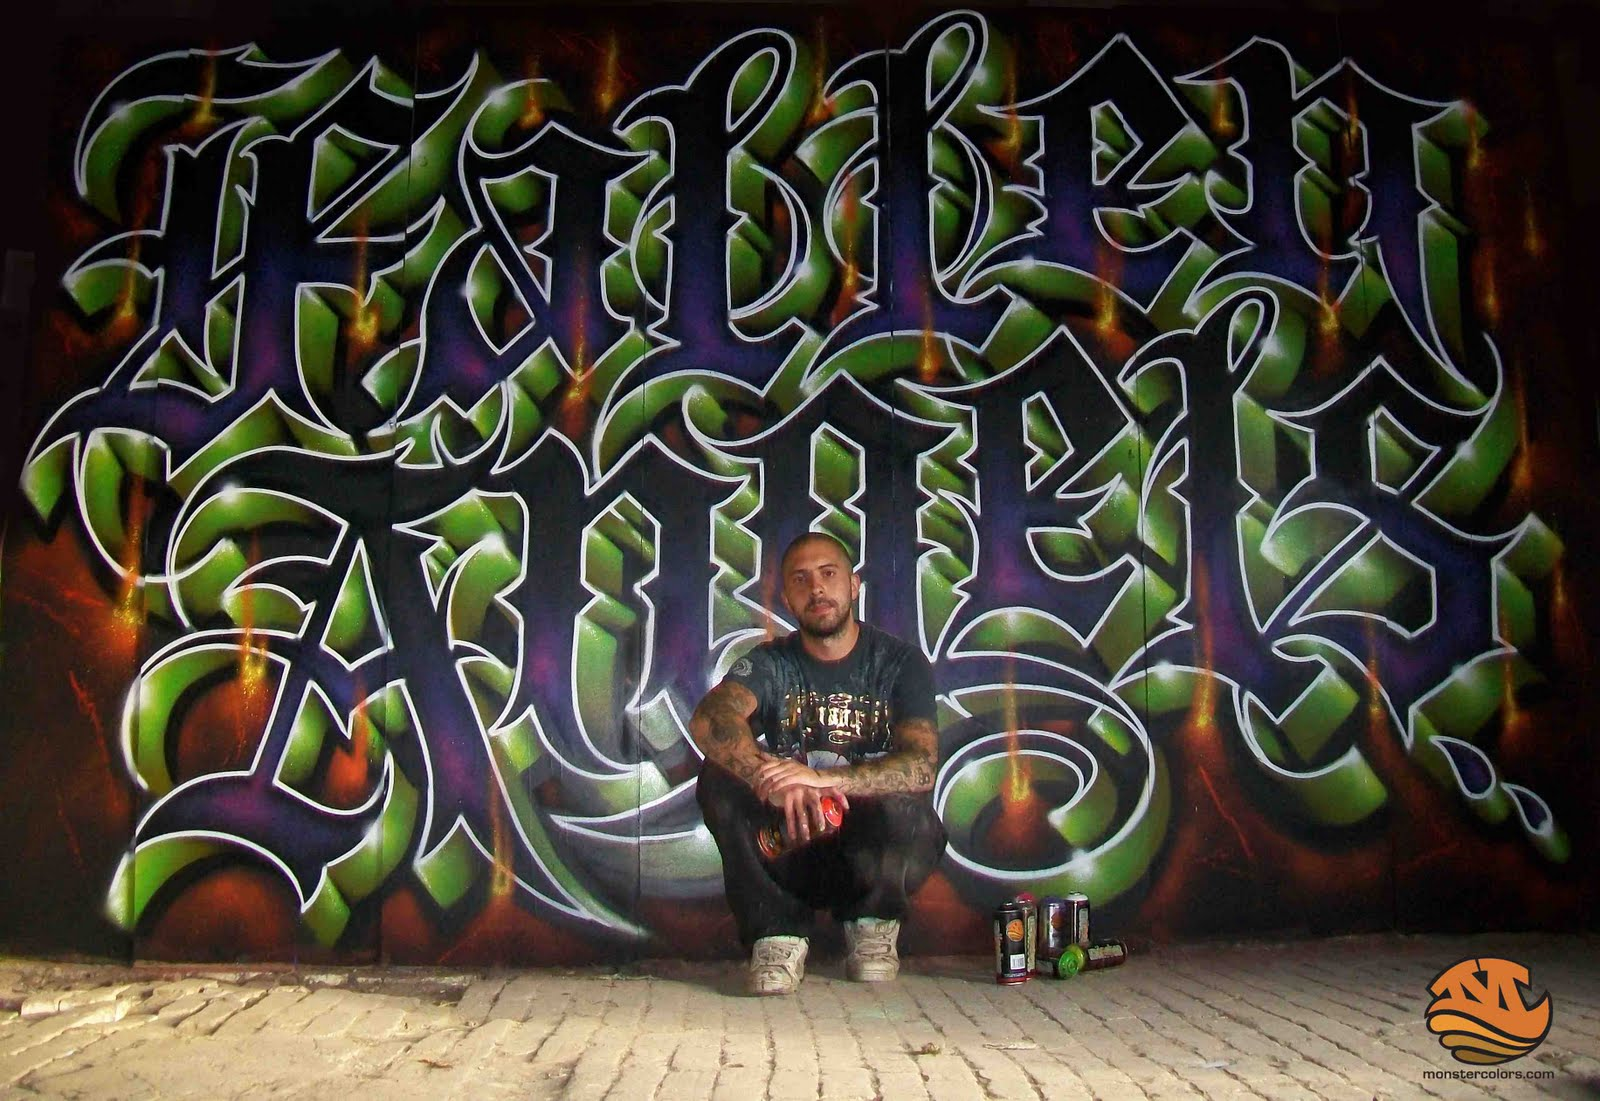 Spray Paint Mask >> Monster Colors,graffiti Blog,spray paint,cans street art ...